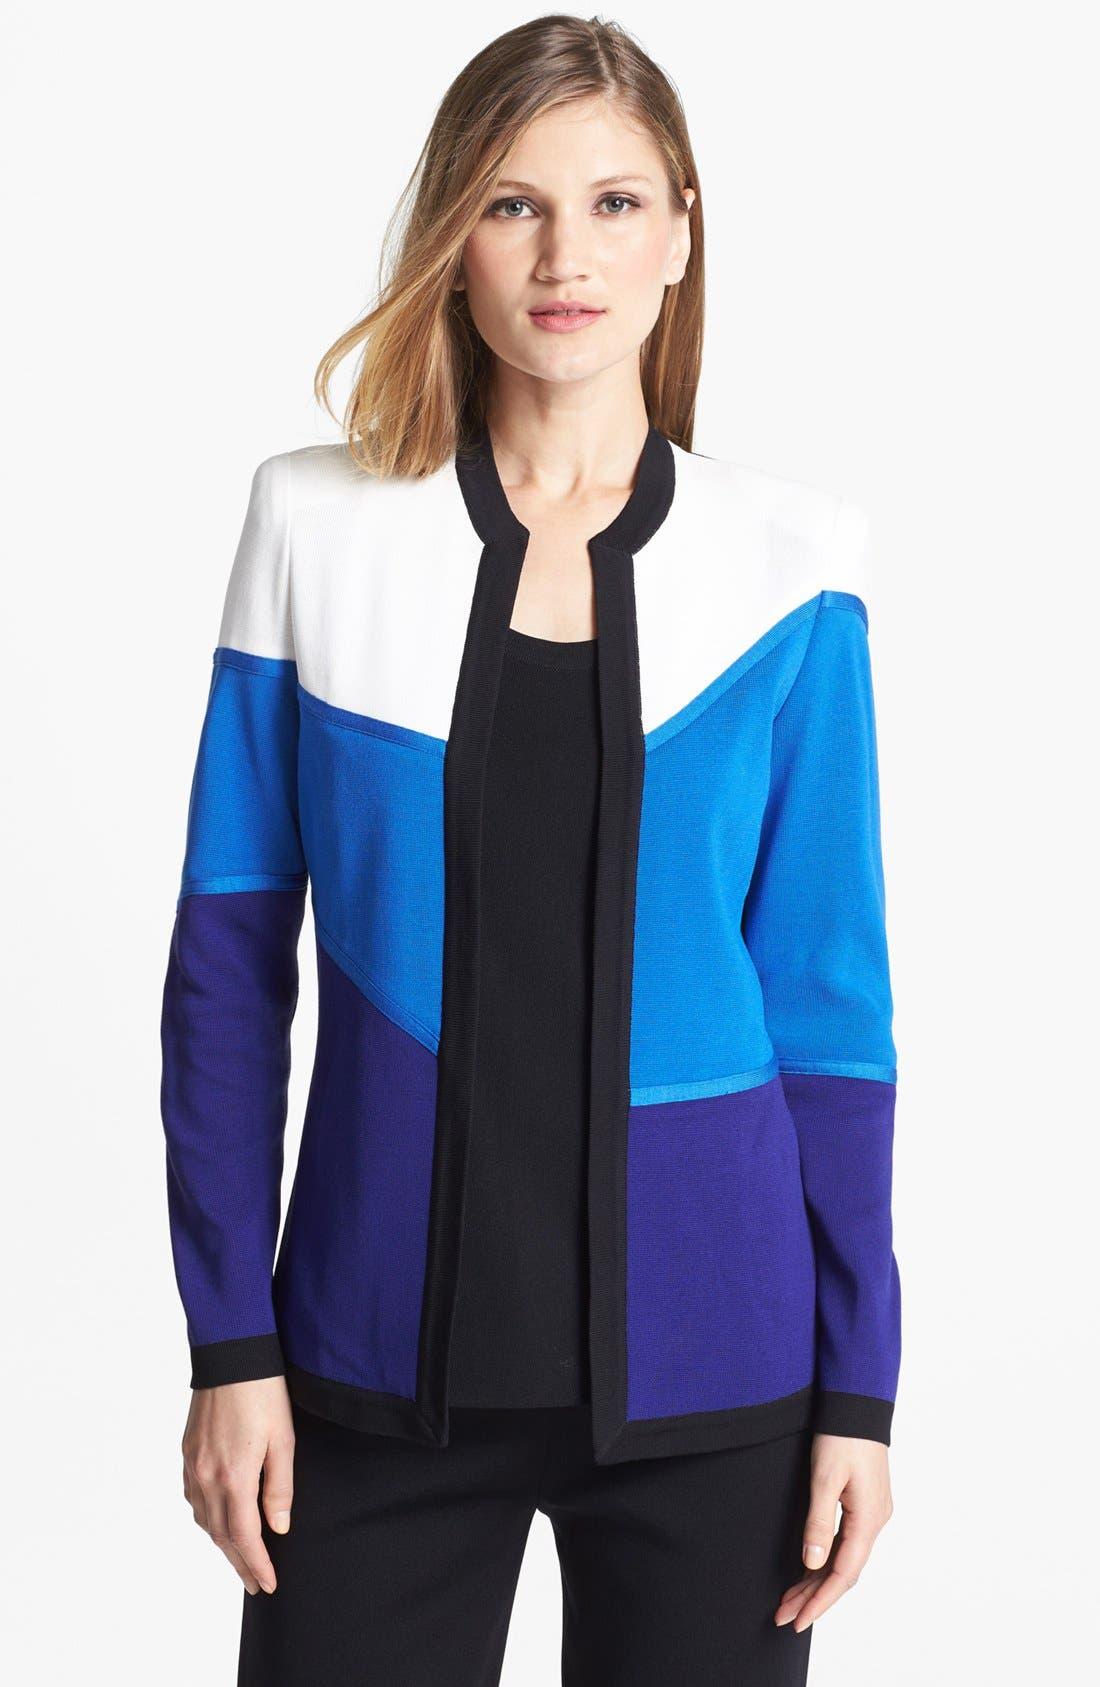 Alternate Image 1 Selected - Misook 'Paulie' Colorblock Knit Jacket